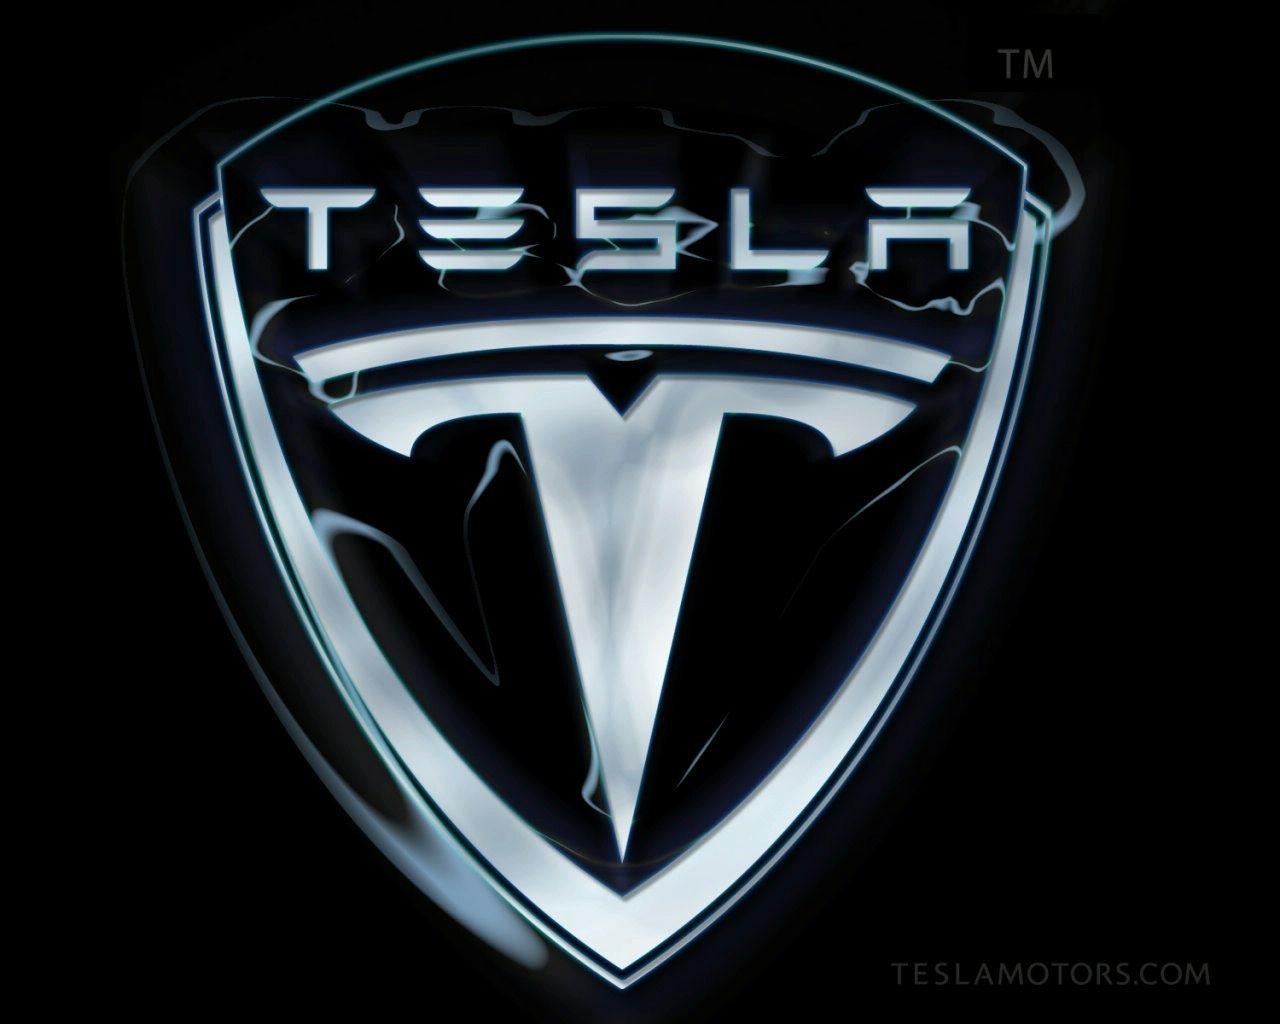 Tesla chooses Atenao